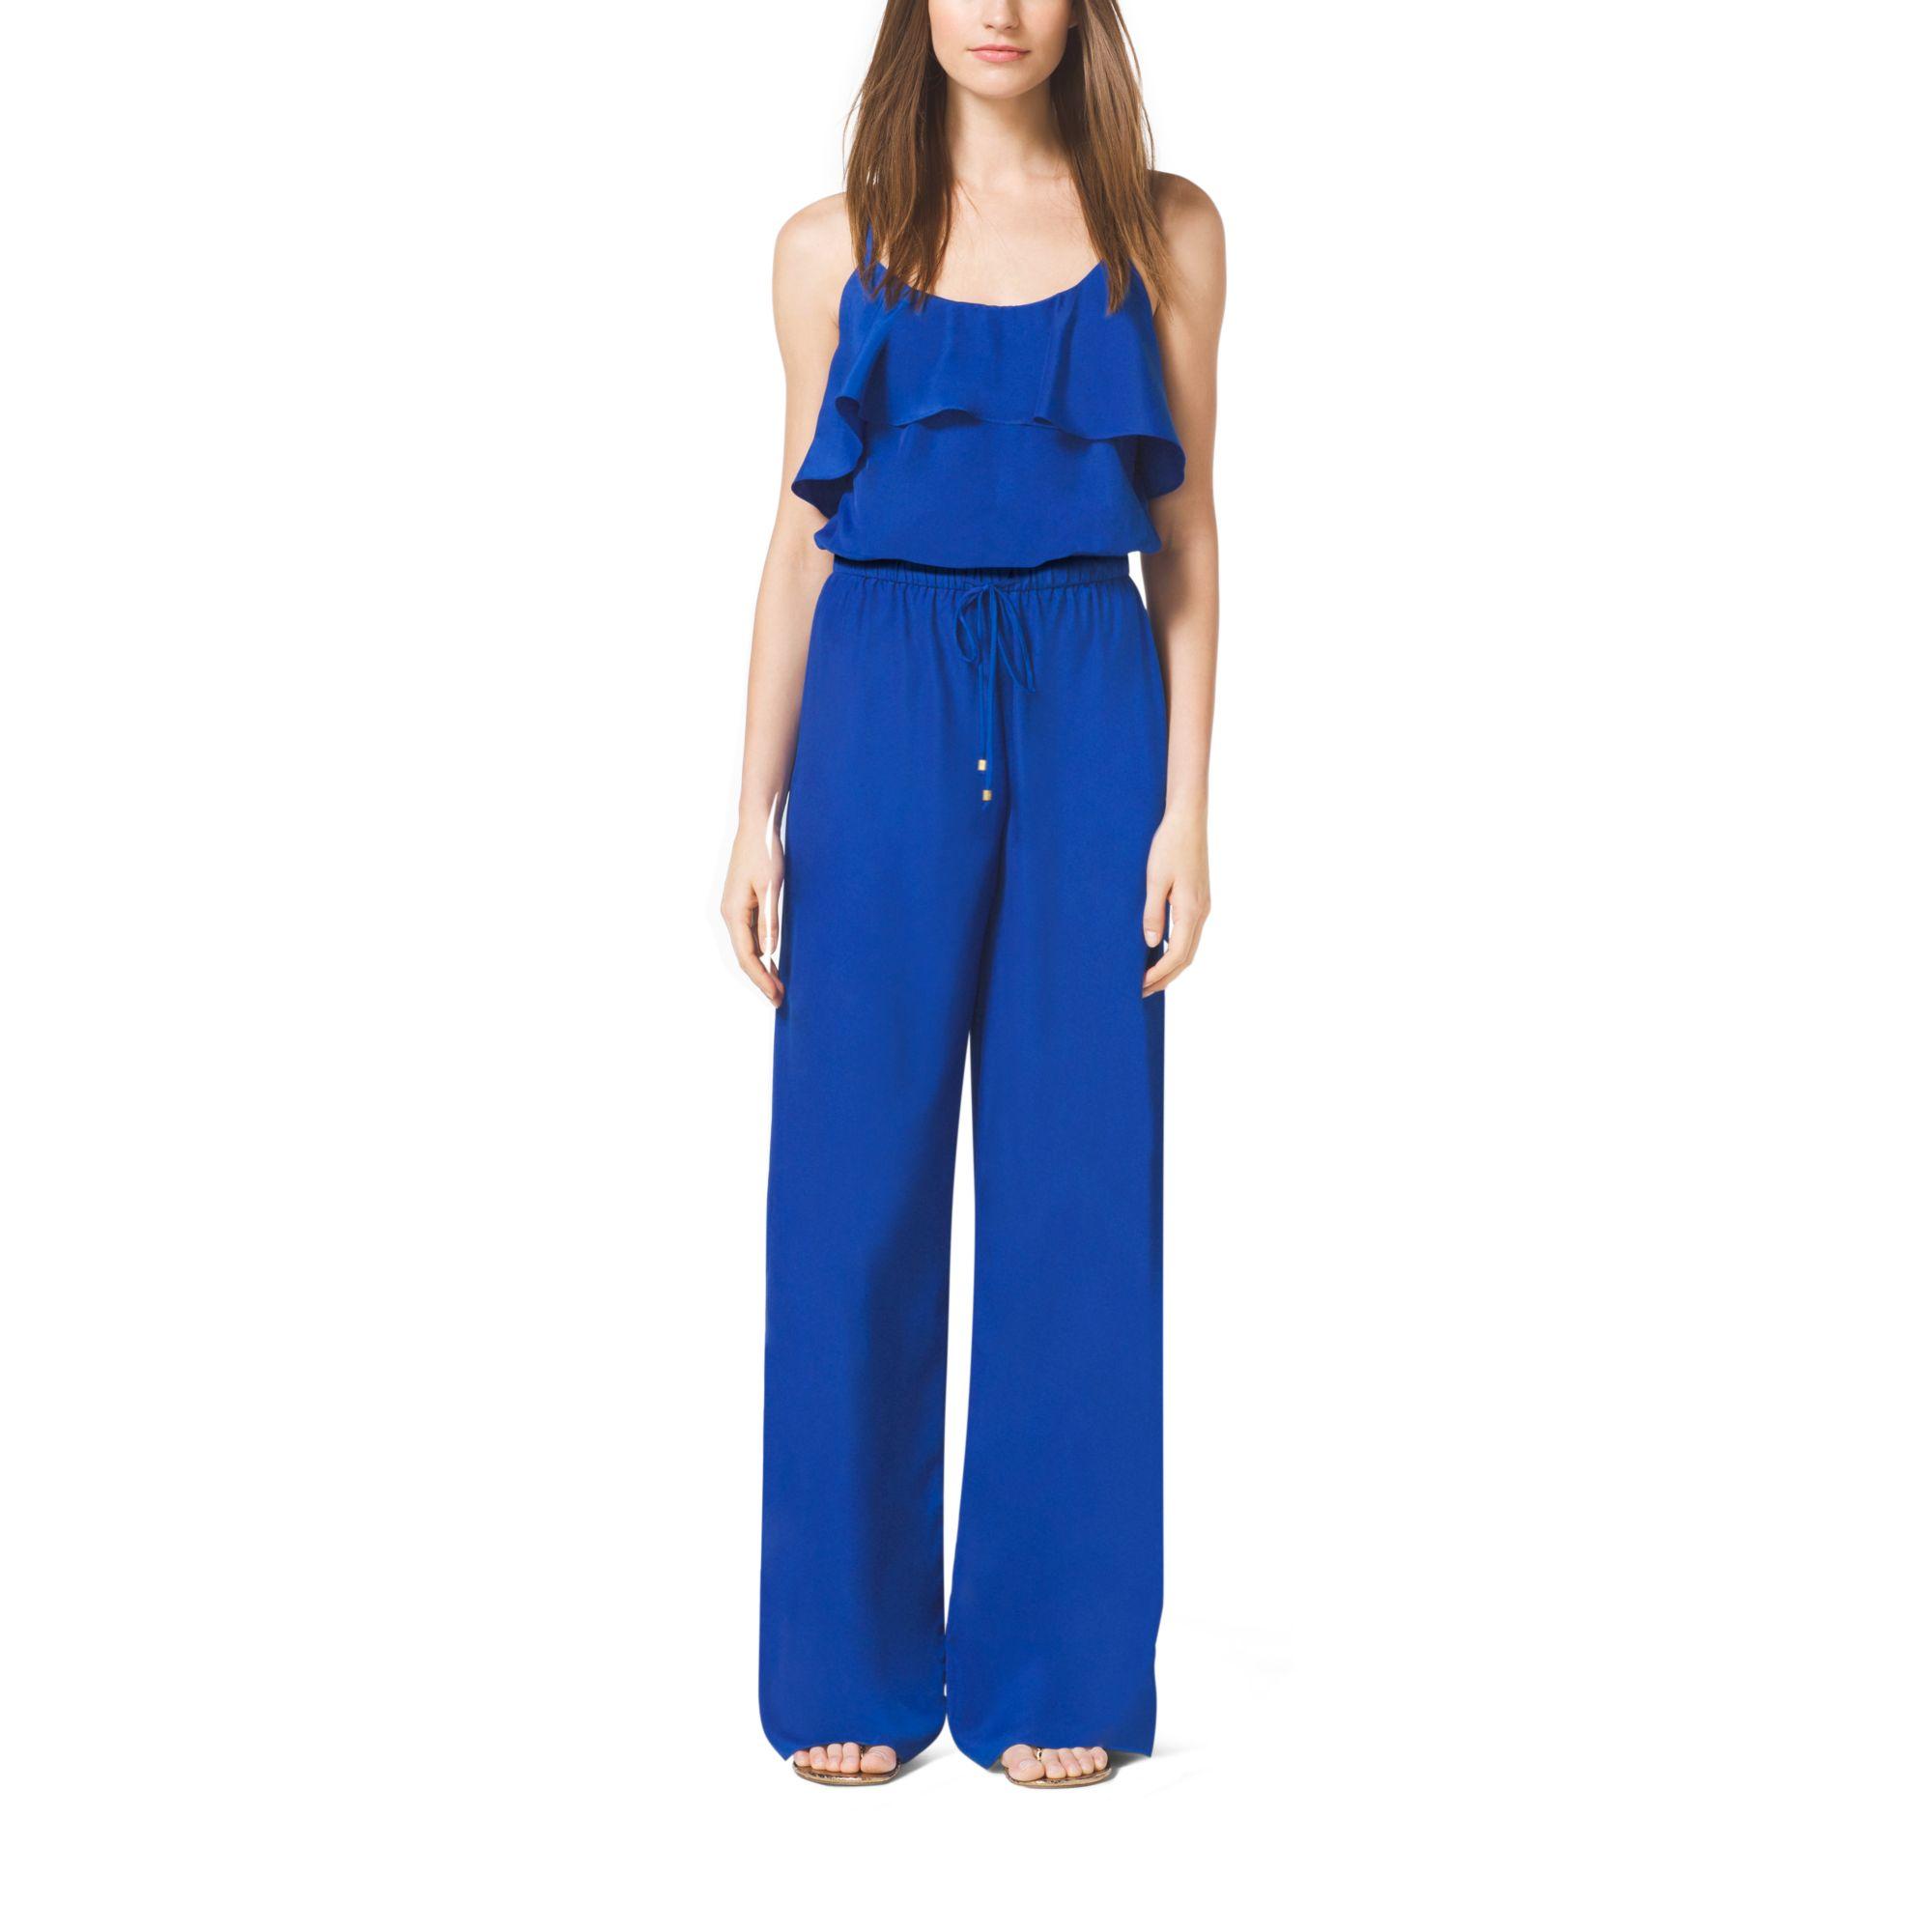 michael kors flounce crepe jumpsuit in blue lyst. Black Bedroom Furniture Sets. Home Design Ideas